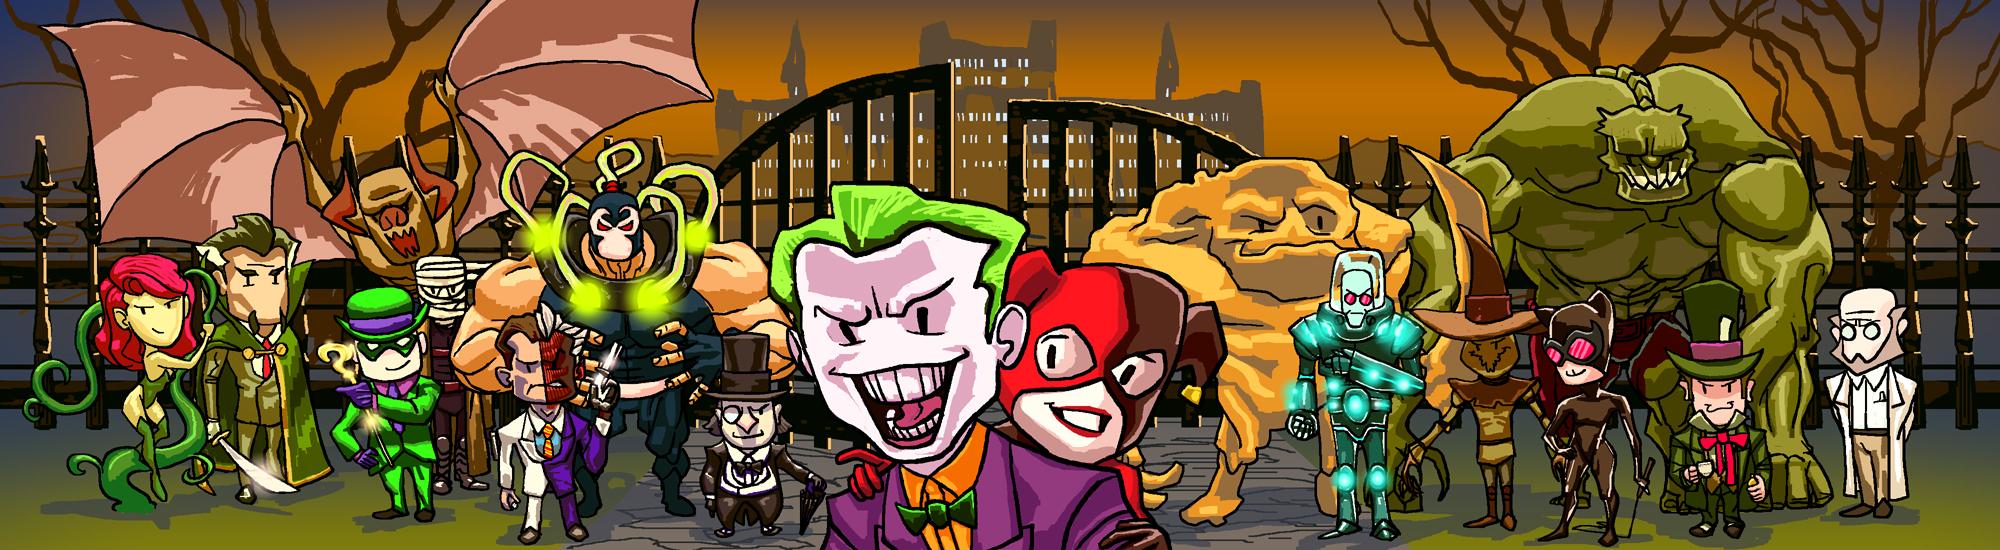 DC Scribble Arkham Asylum Breakout by jokoso